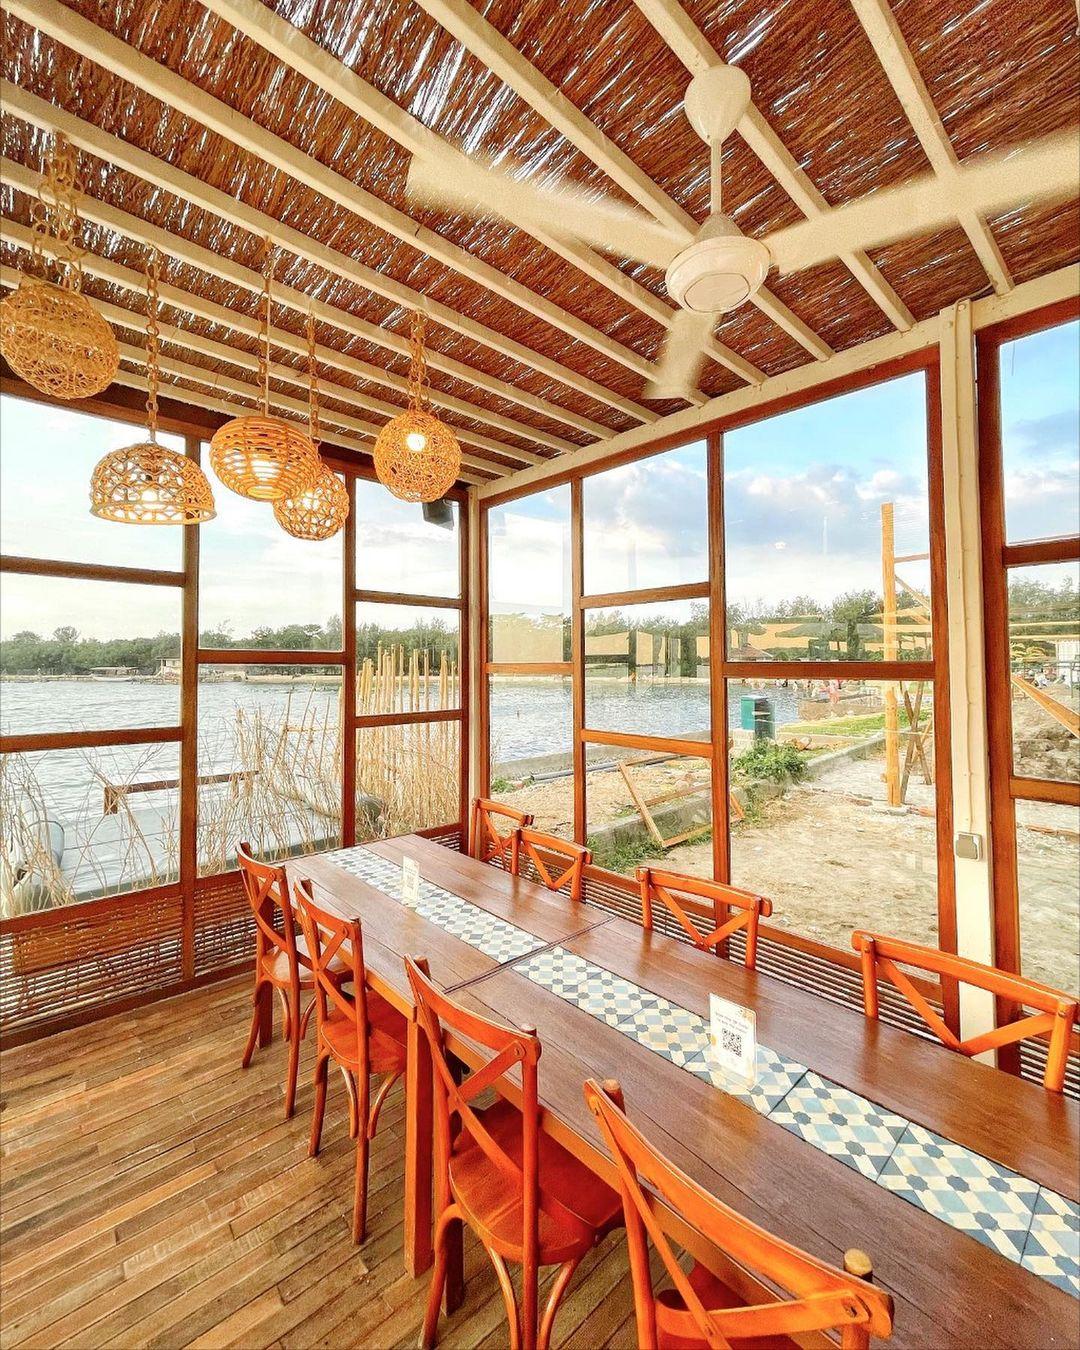 Bagian Indoor La Playa Cafe Semarang Image From @travelokaeats